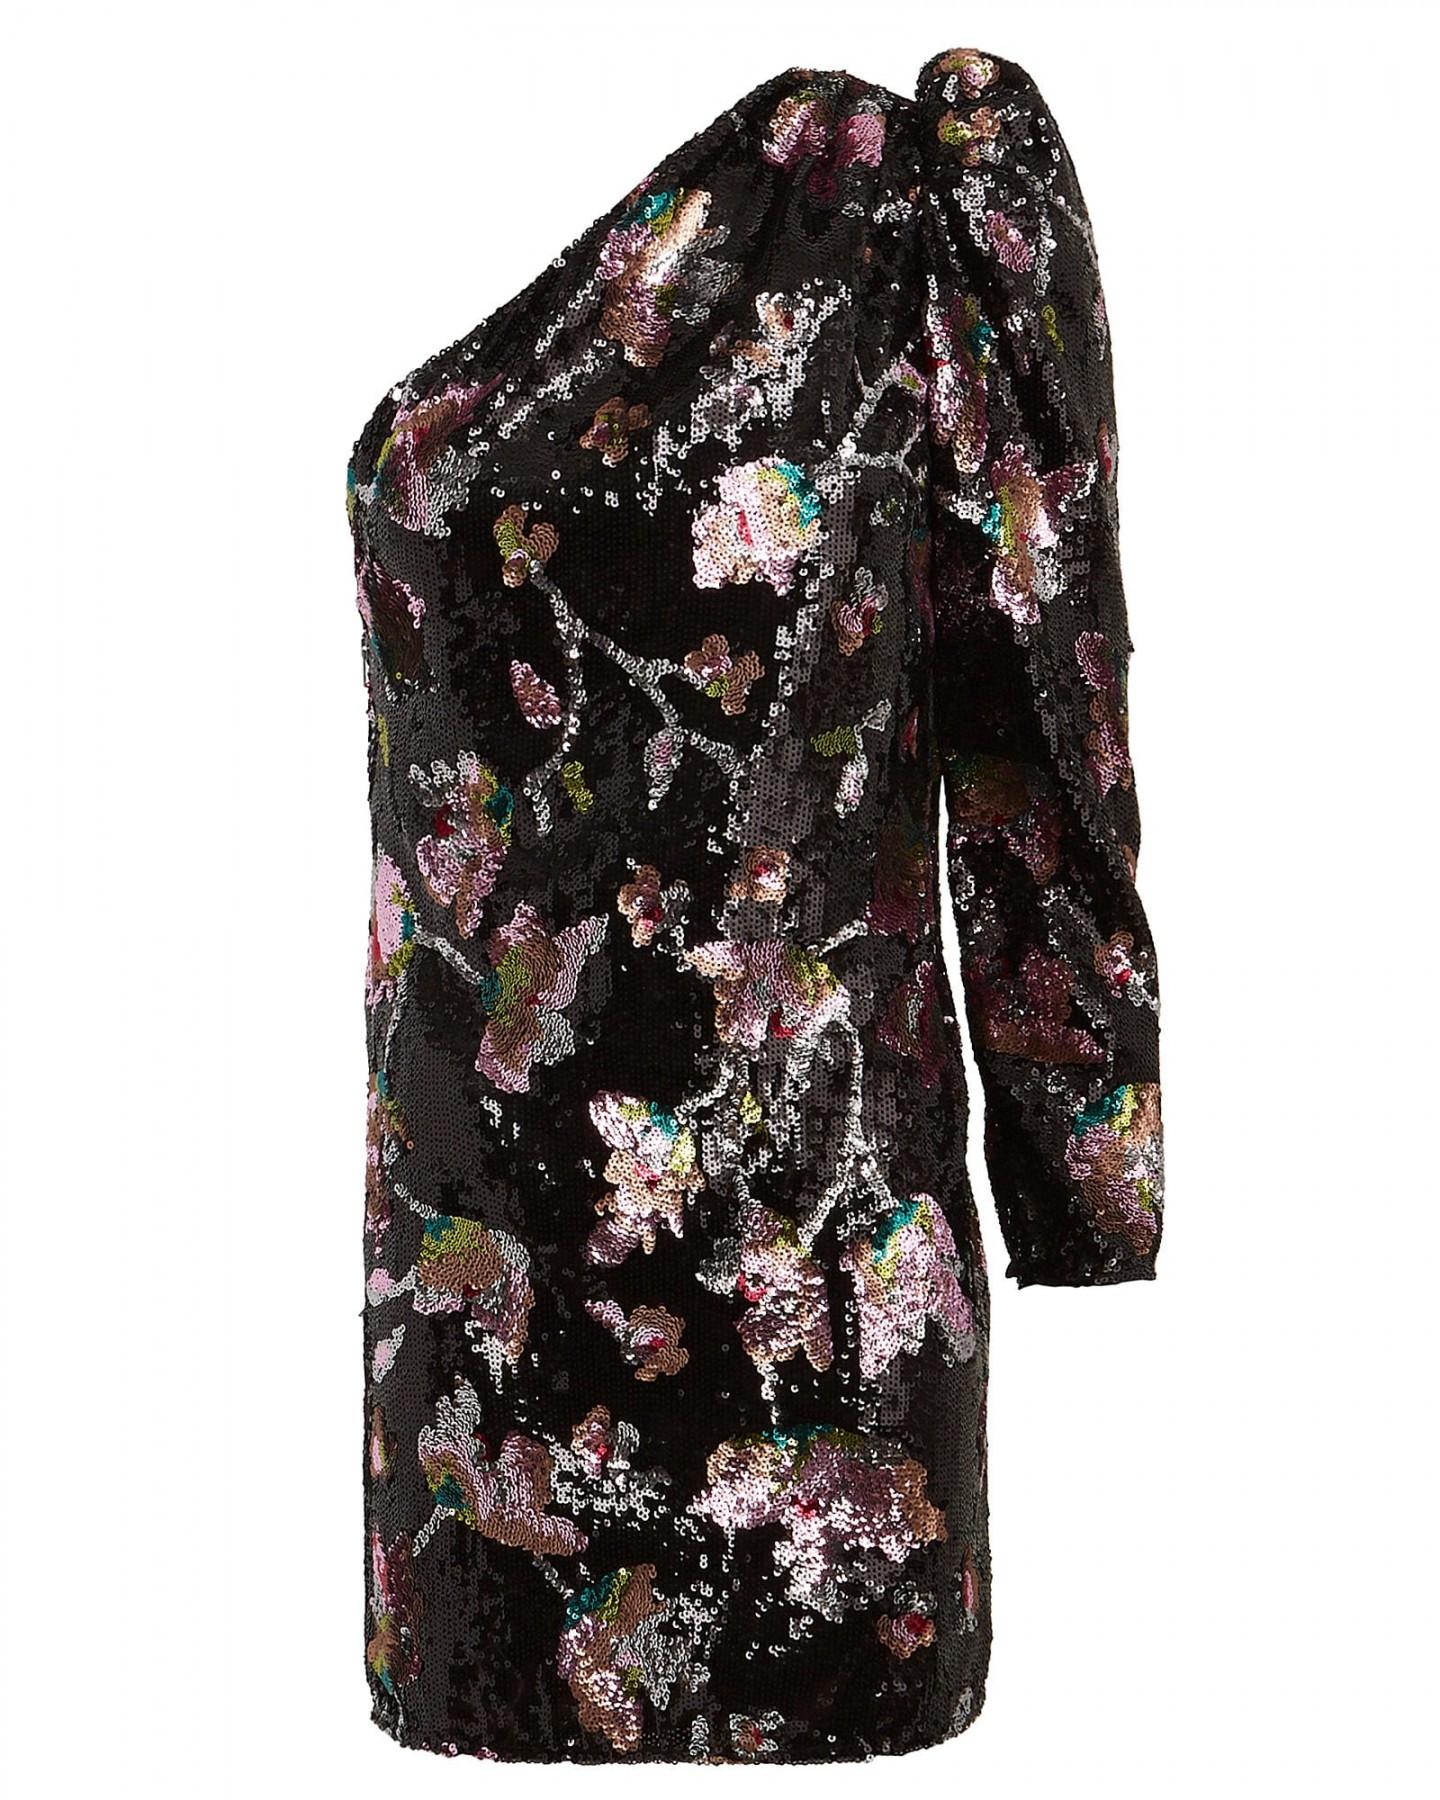 SELF-PORTRAIT Midnight Bloom Sequin One-Shoulder Dress